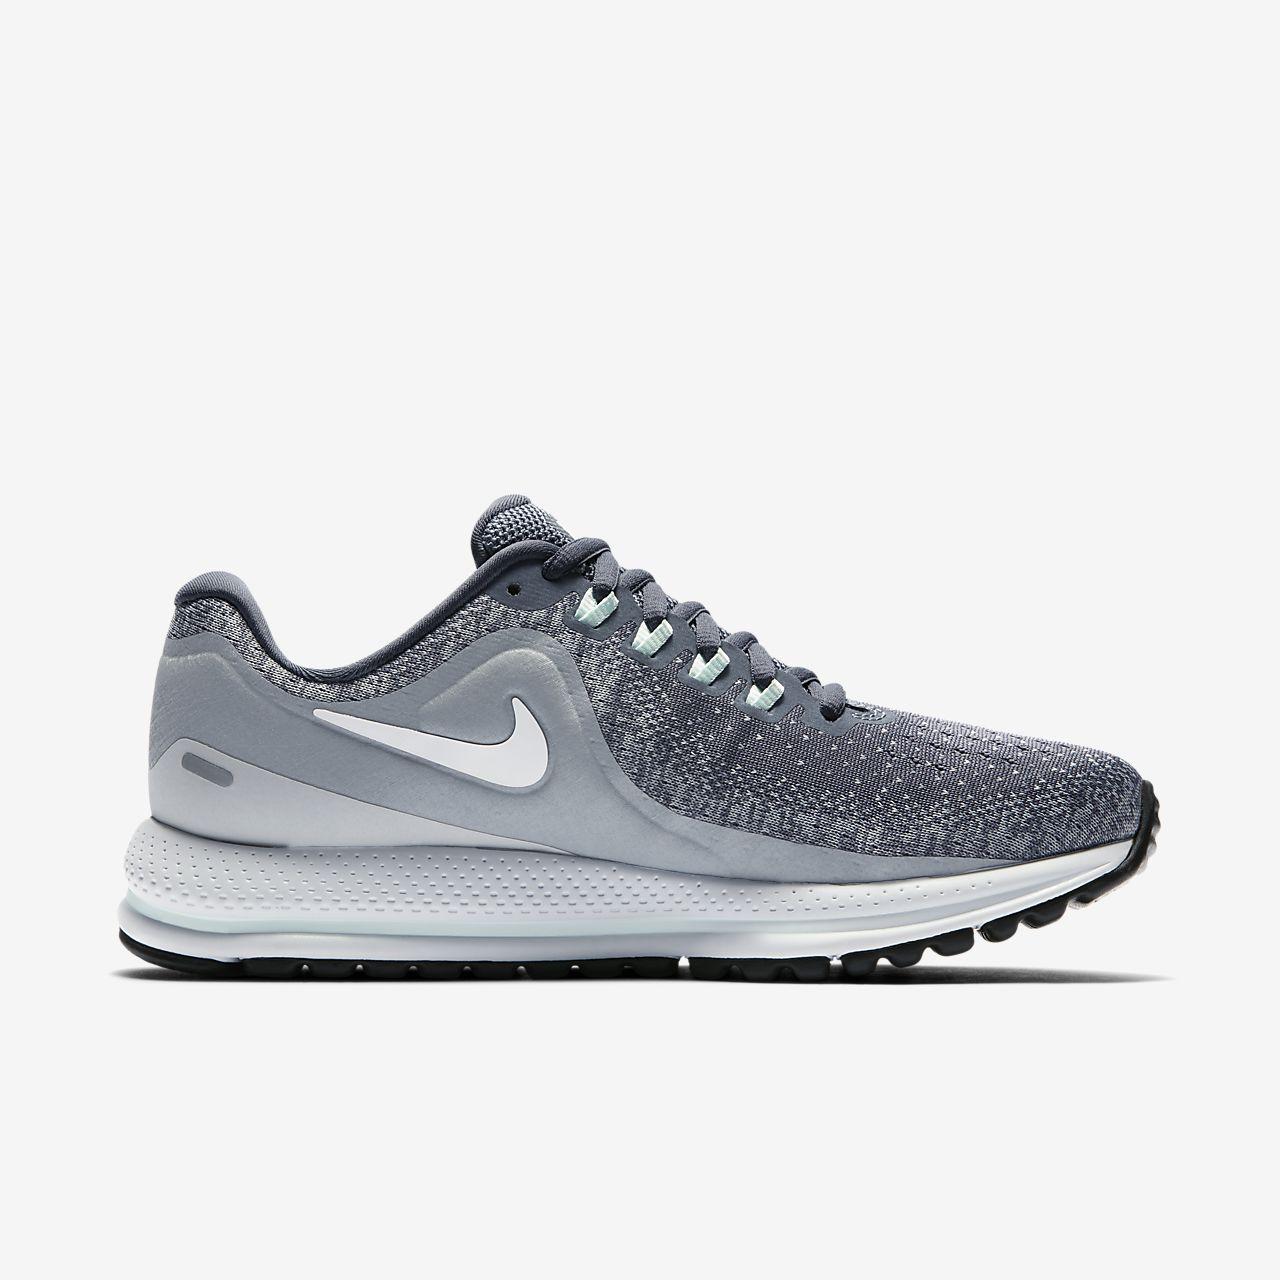 best service 7d401 a8668 ... Nike Air Zoom Vomero 13 Women s Running Shoe